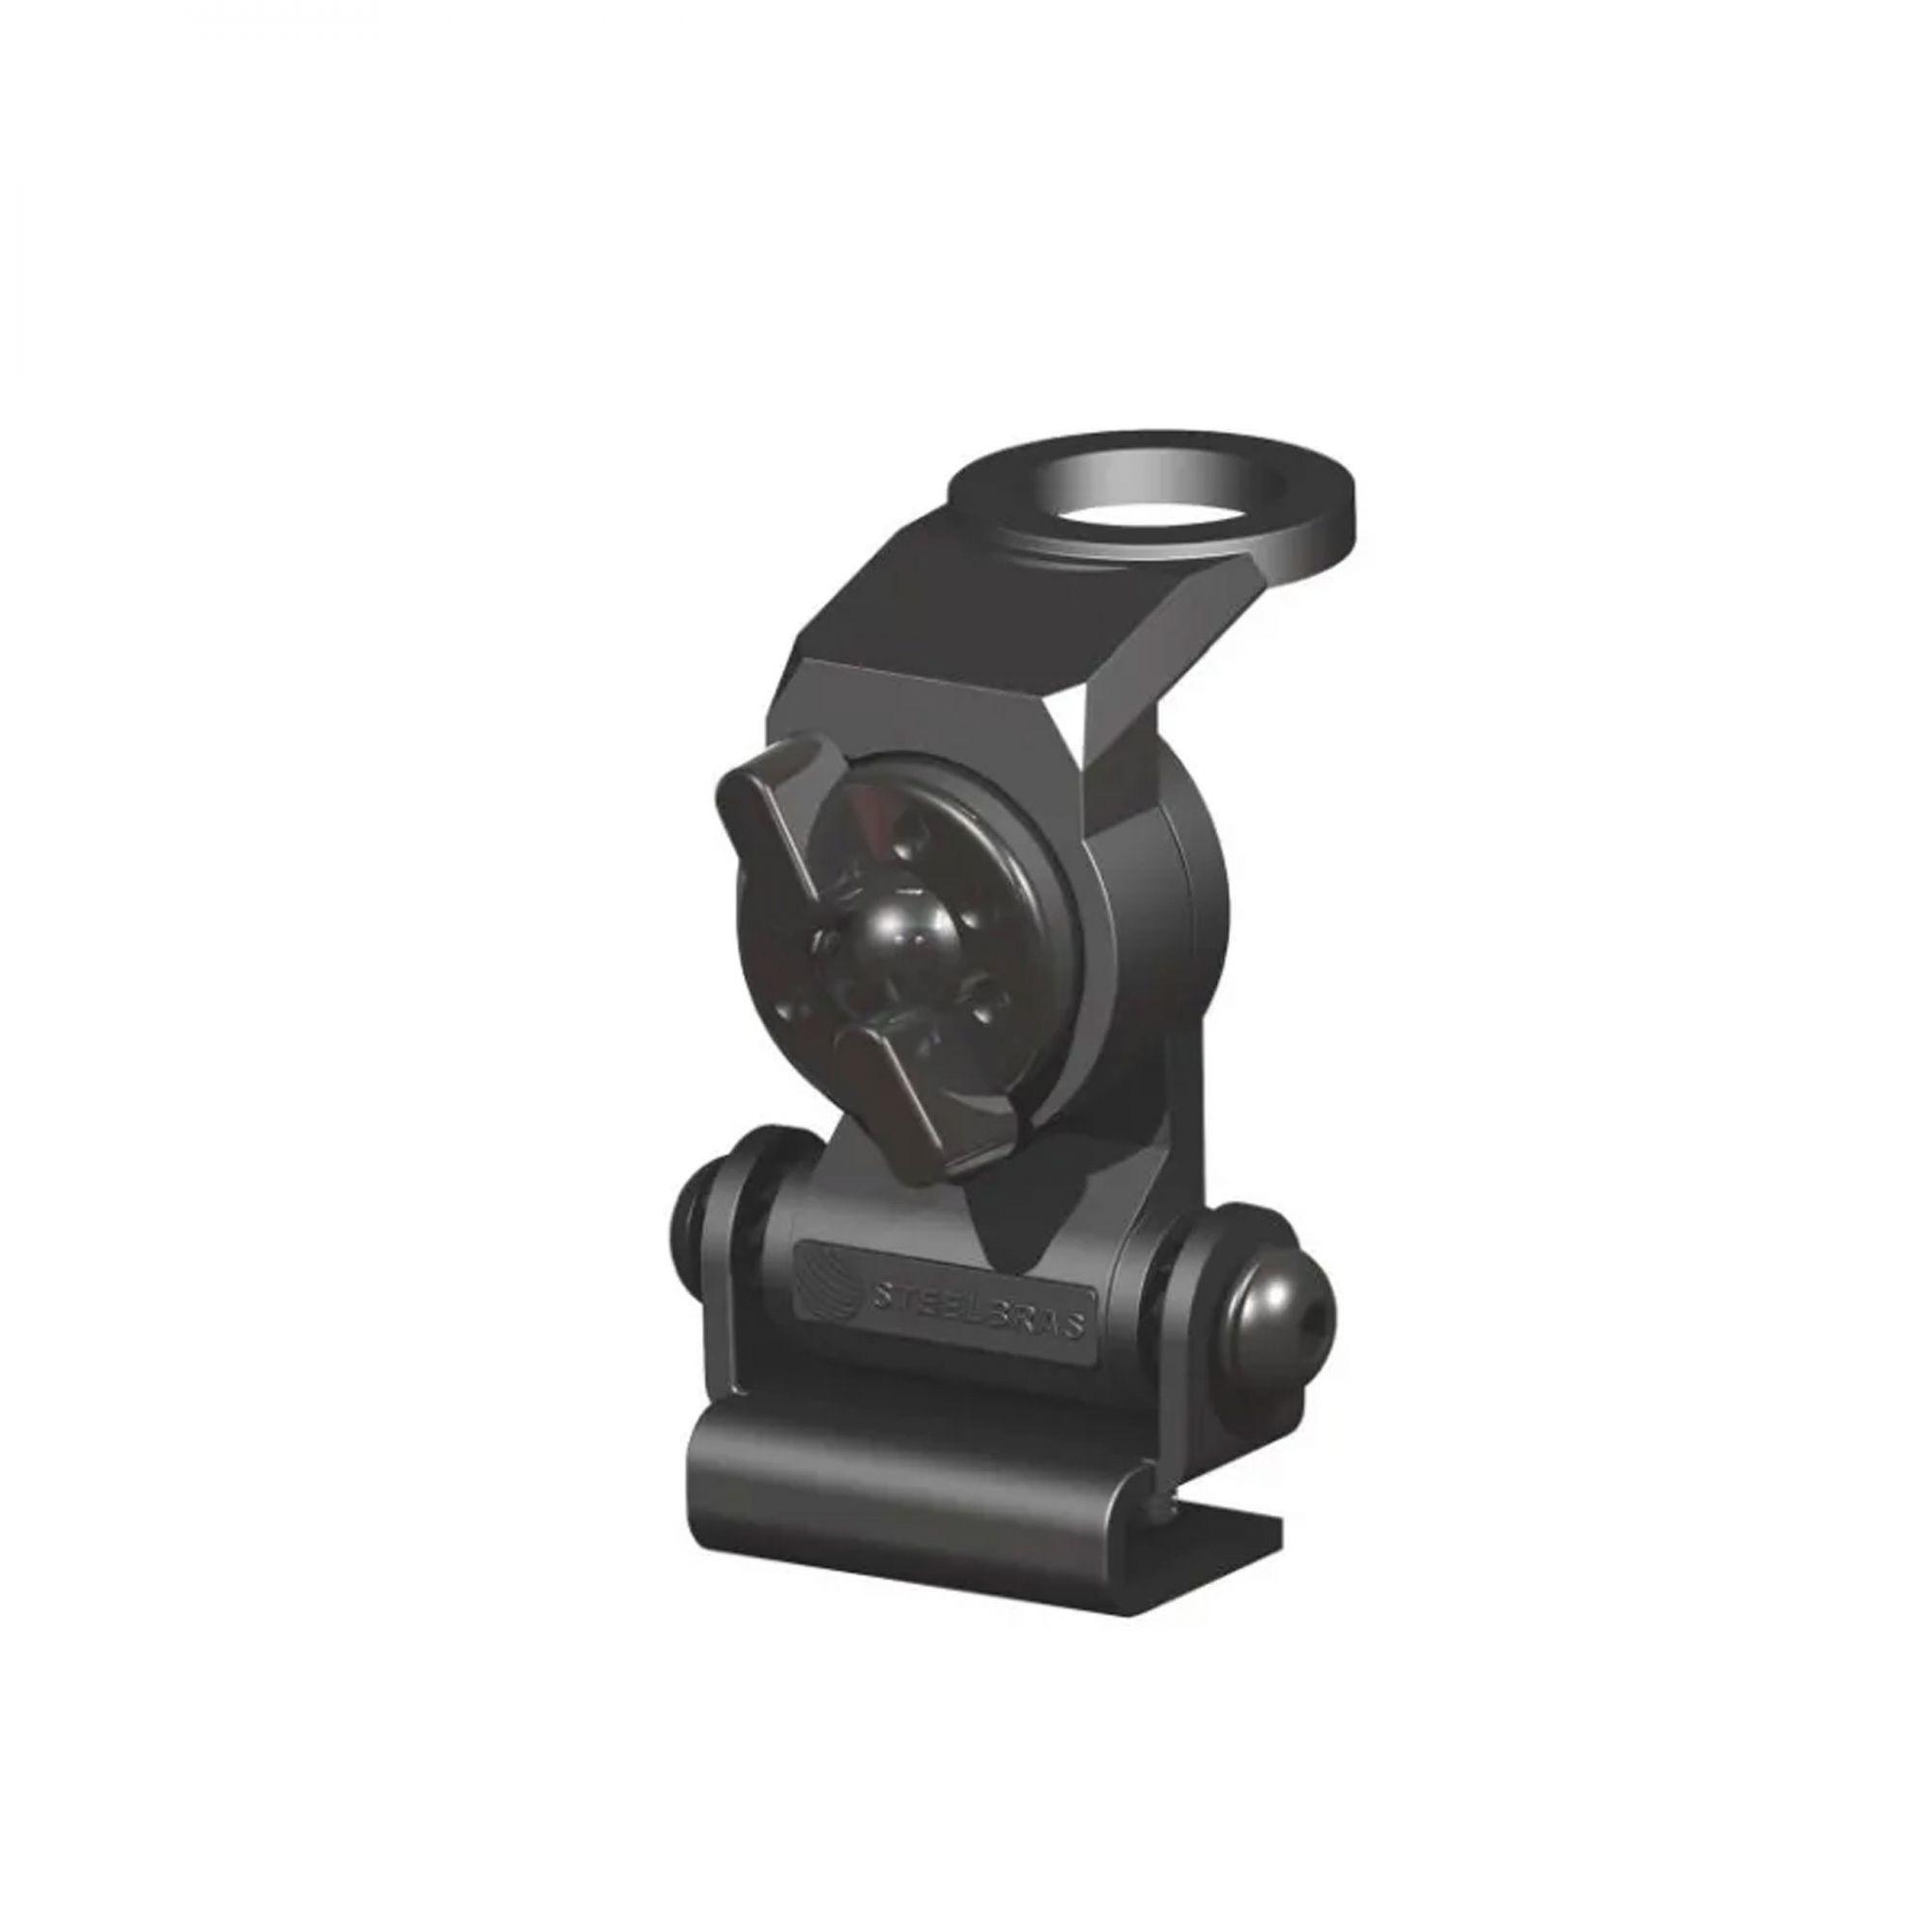 Suporte Biarticulado Porta-Malas Mini Steelbras - AP7733